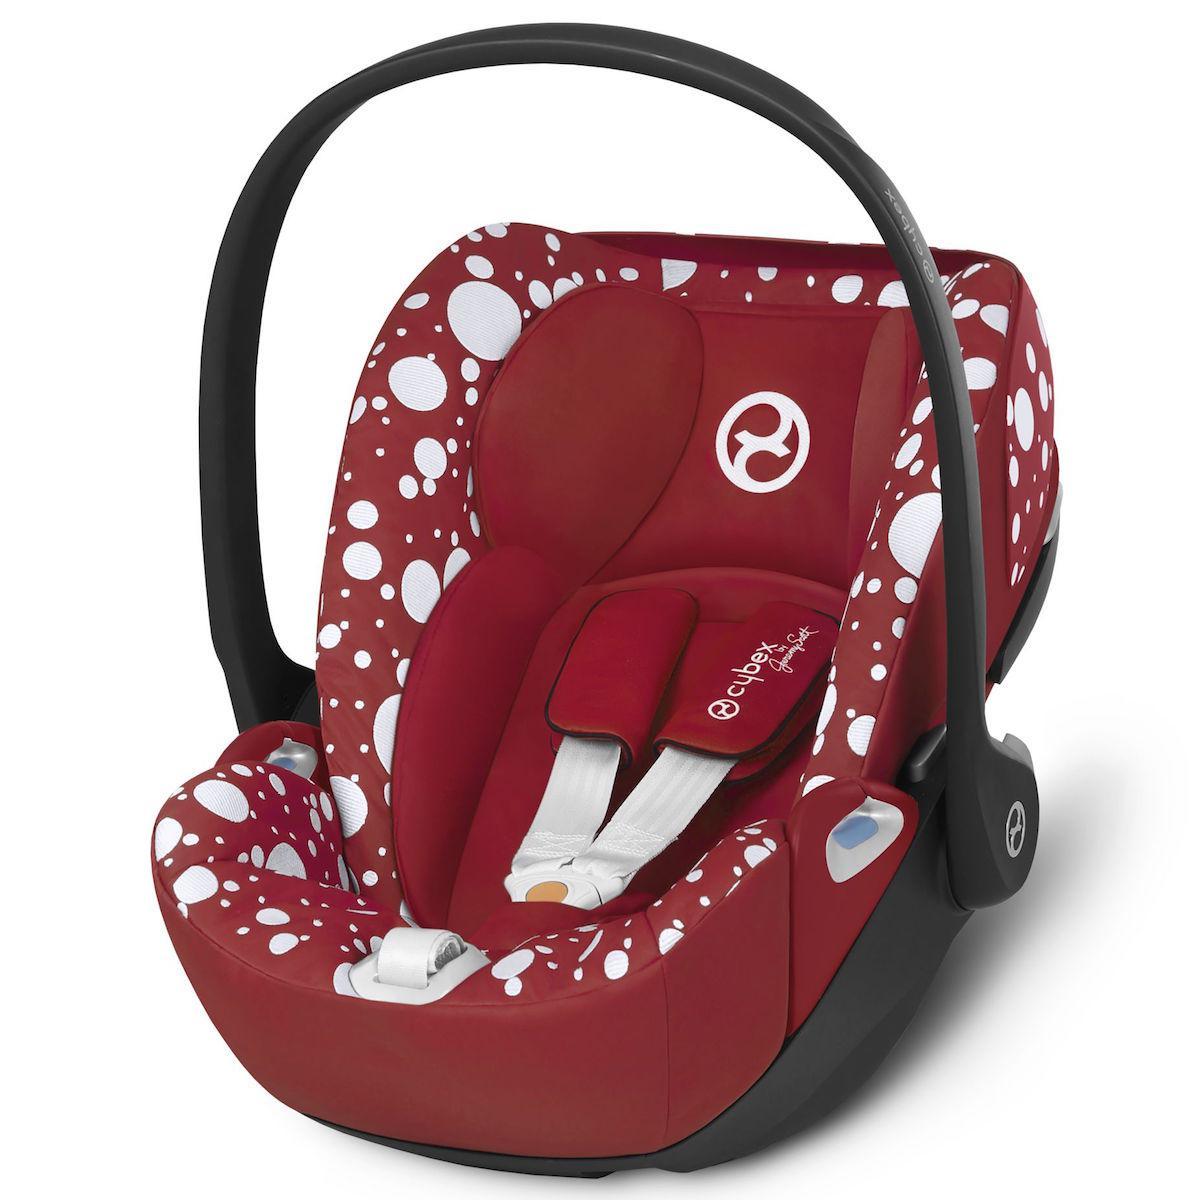 Siège auto gr0+ CLOUD Z I-SIZE Cybex Petticoat Red dark red